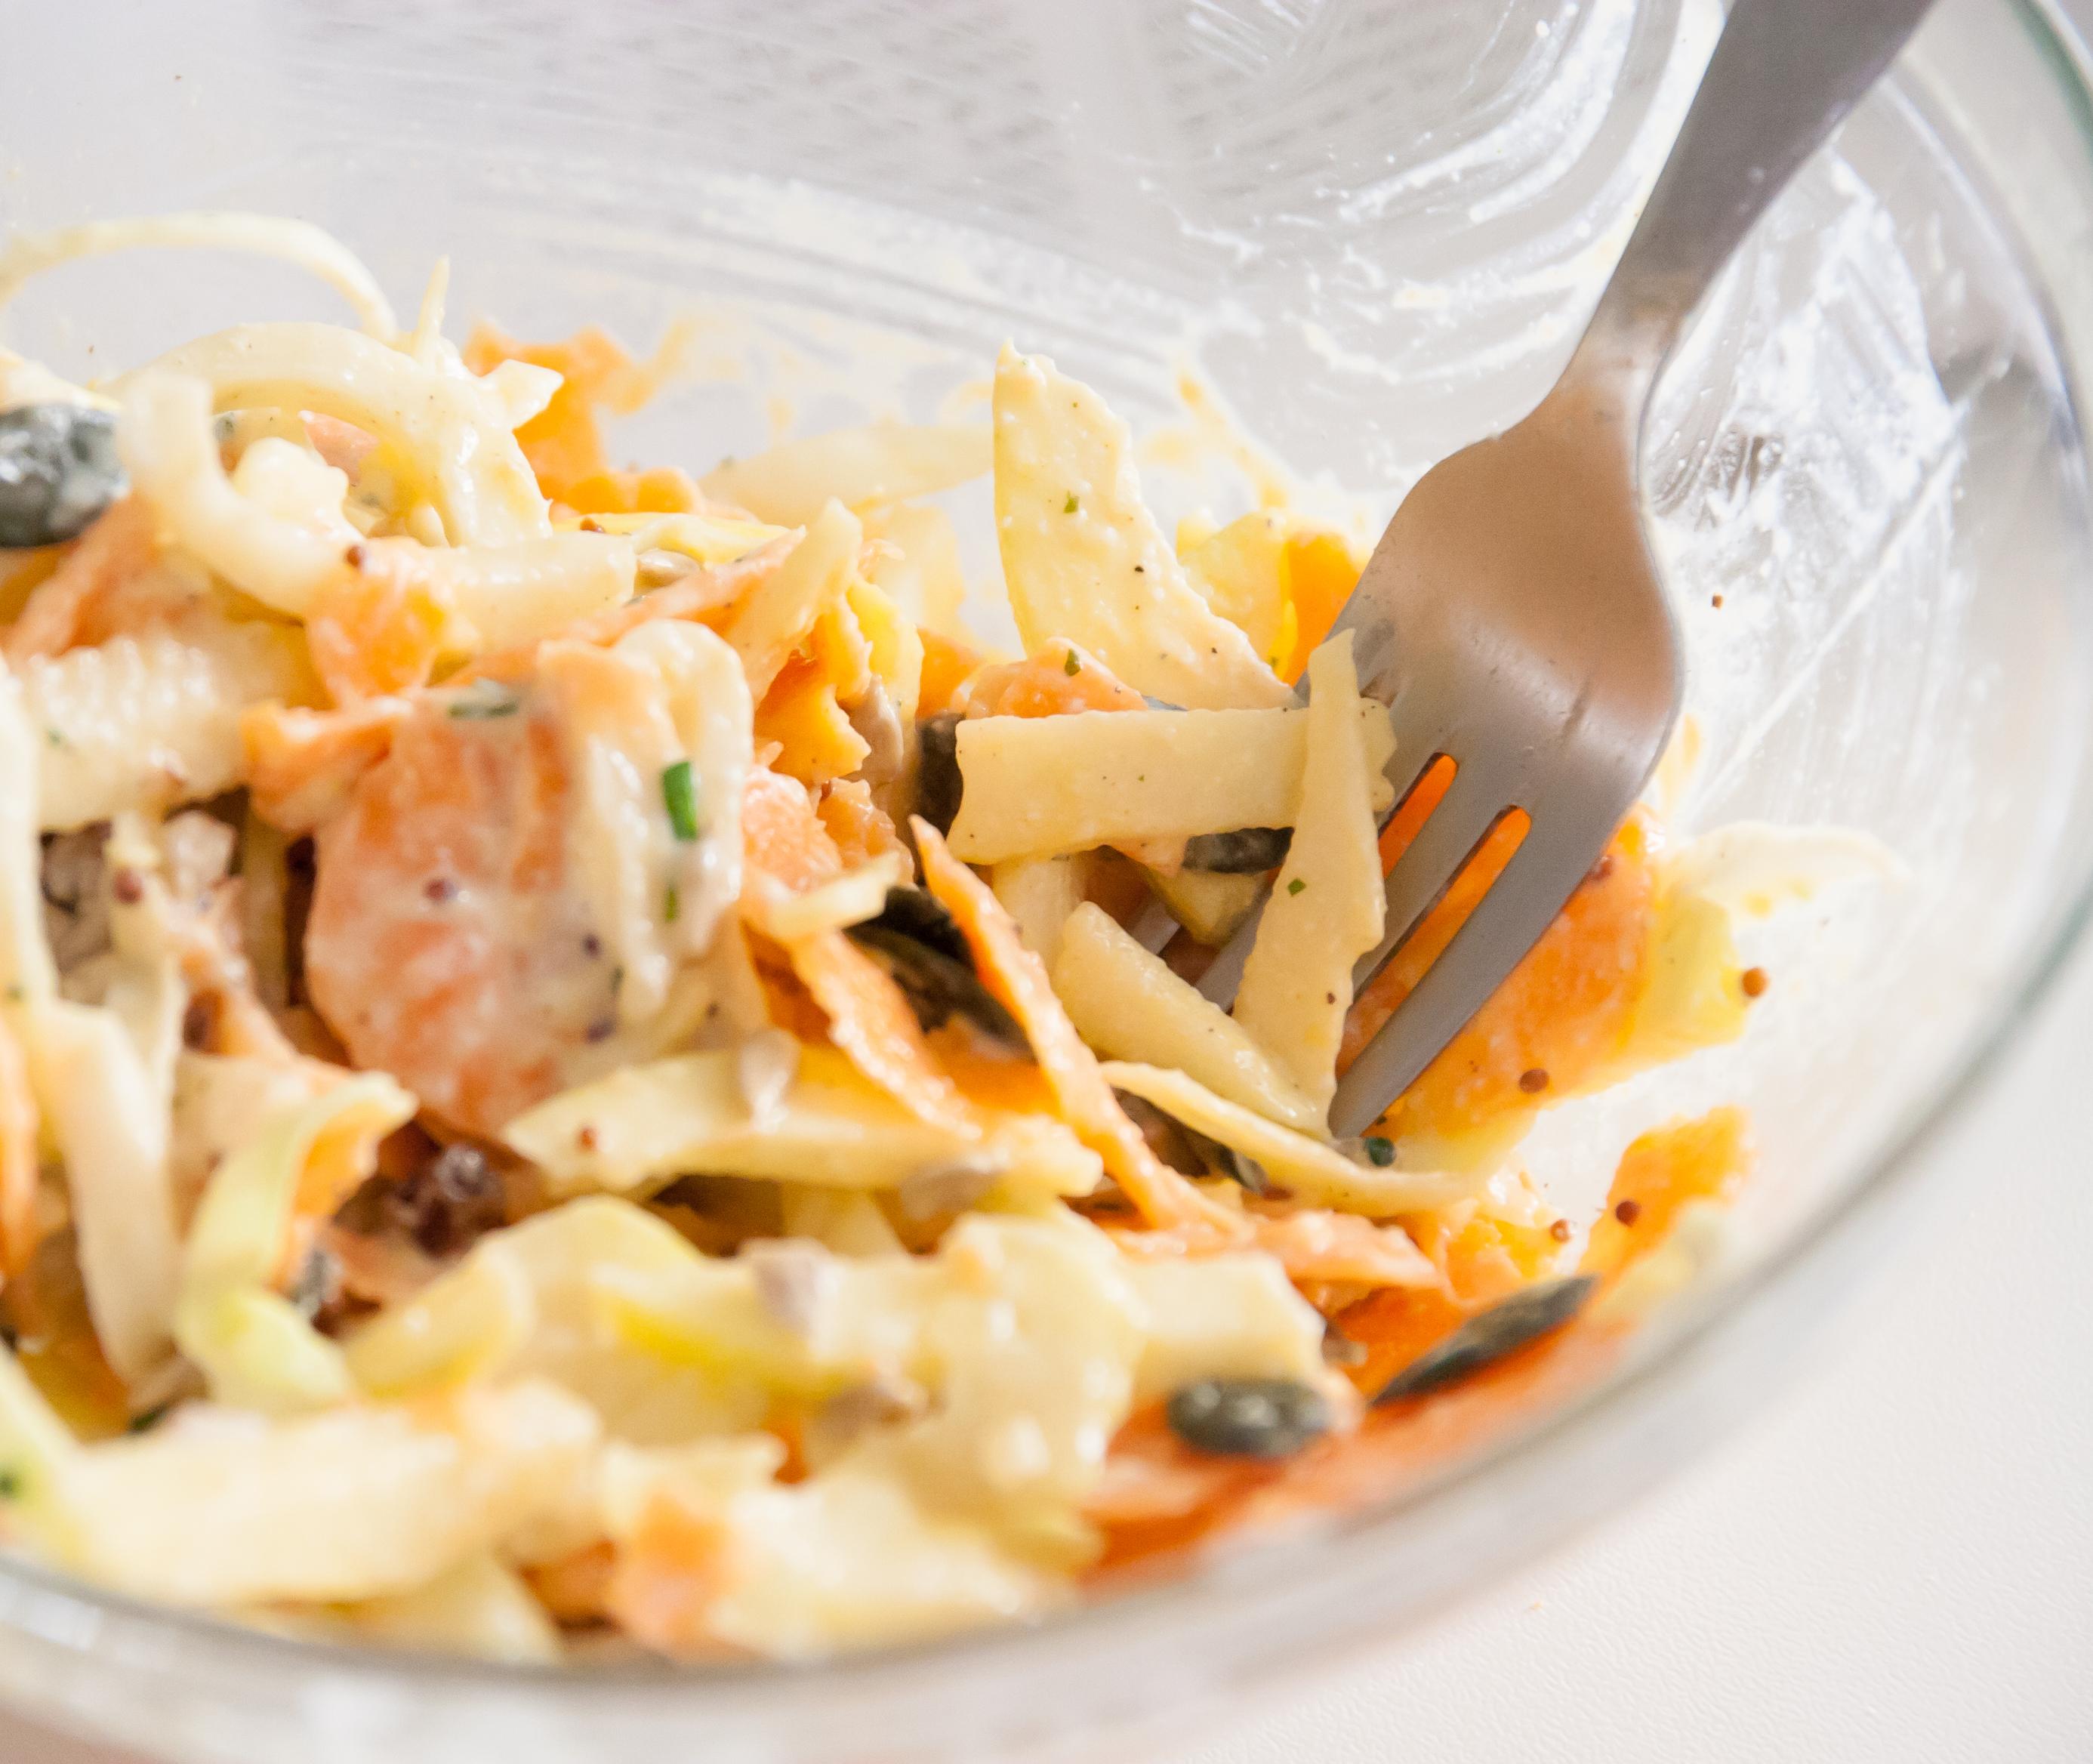 Salade chou/carotte/pomme